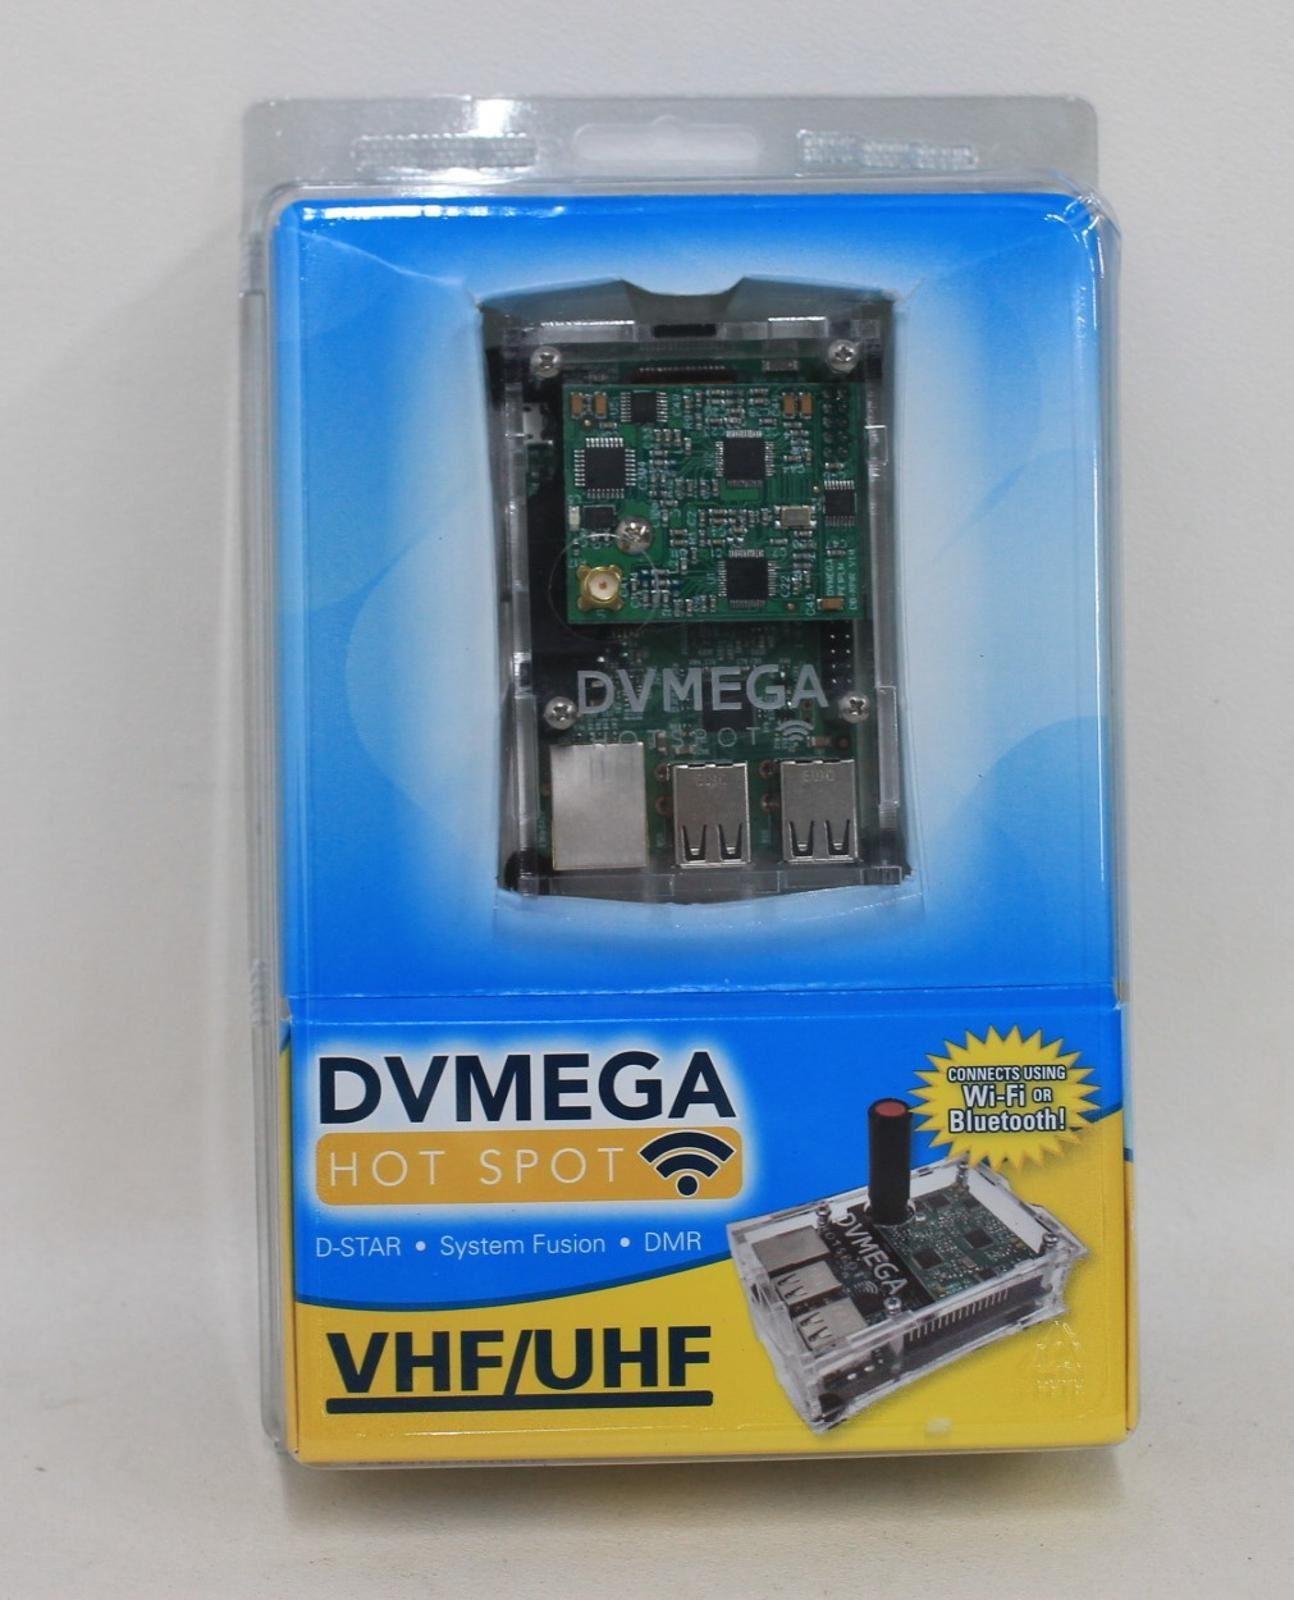 NEW DVMEGA HOT SPOT Dual band VHF/UHF Prebuilt Hotspot Kit For Digital Radios